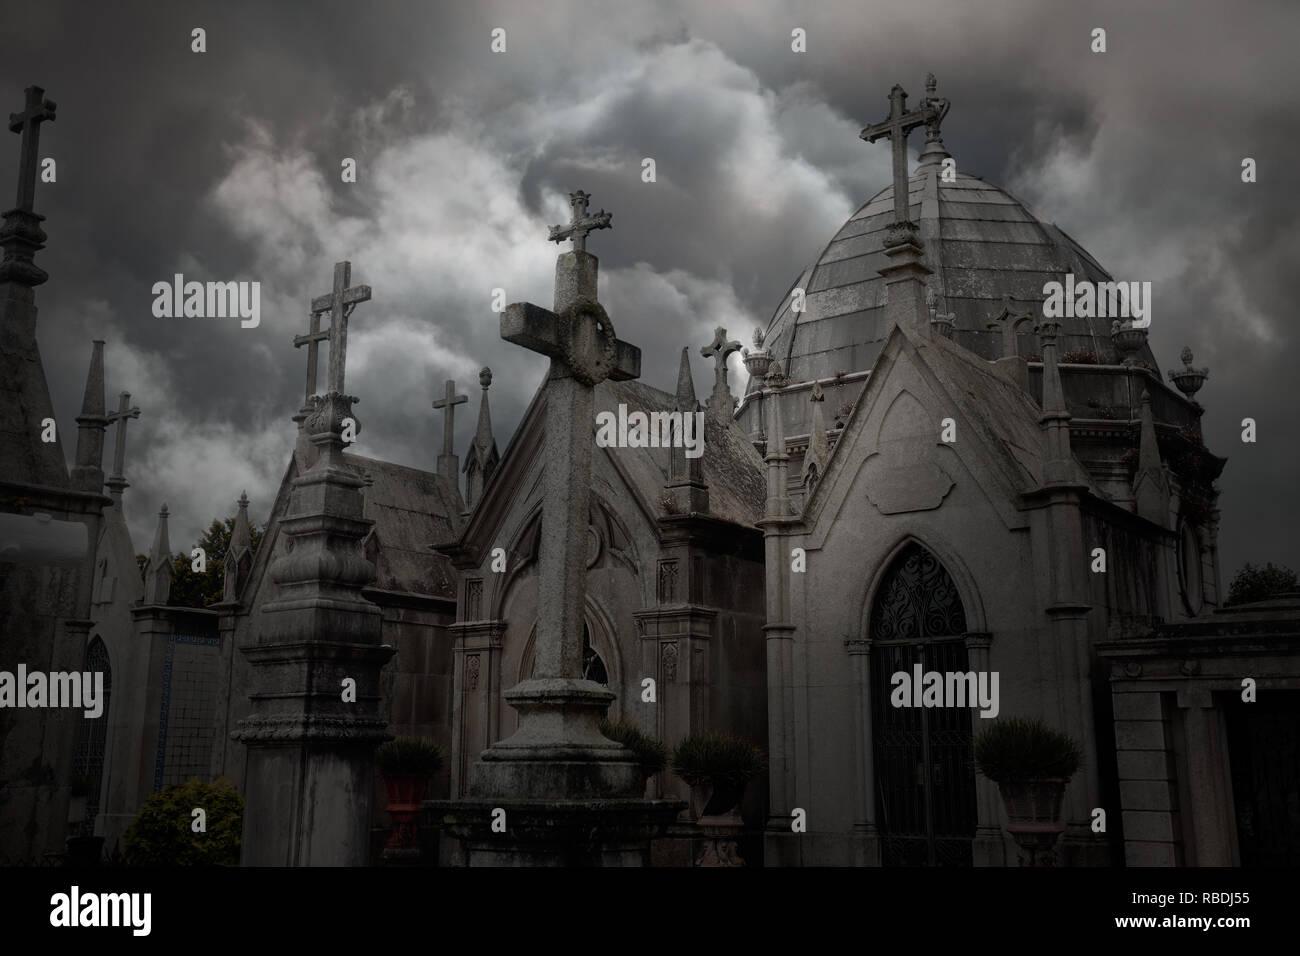 Old dark european cemetery against a dramatic cloudy sky